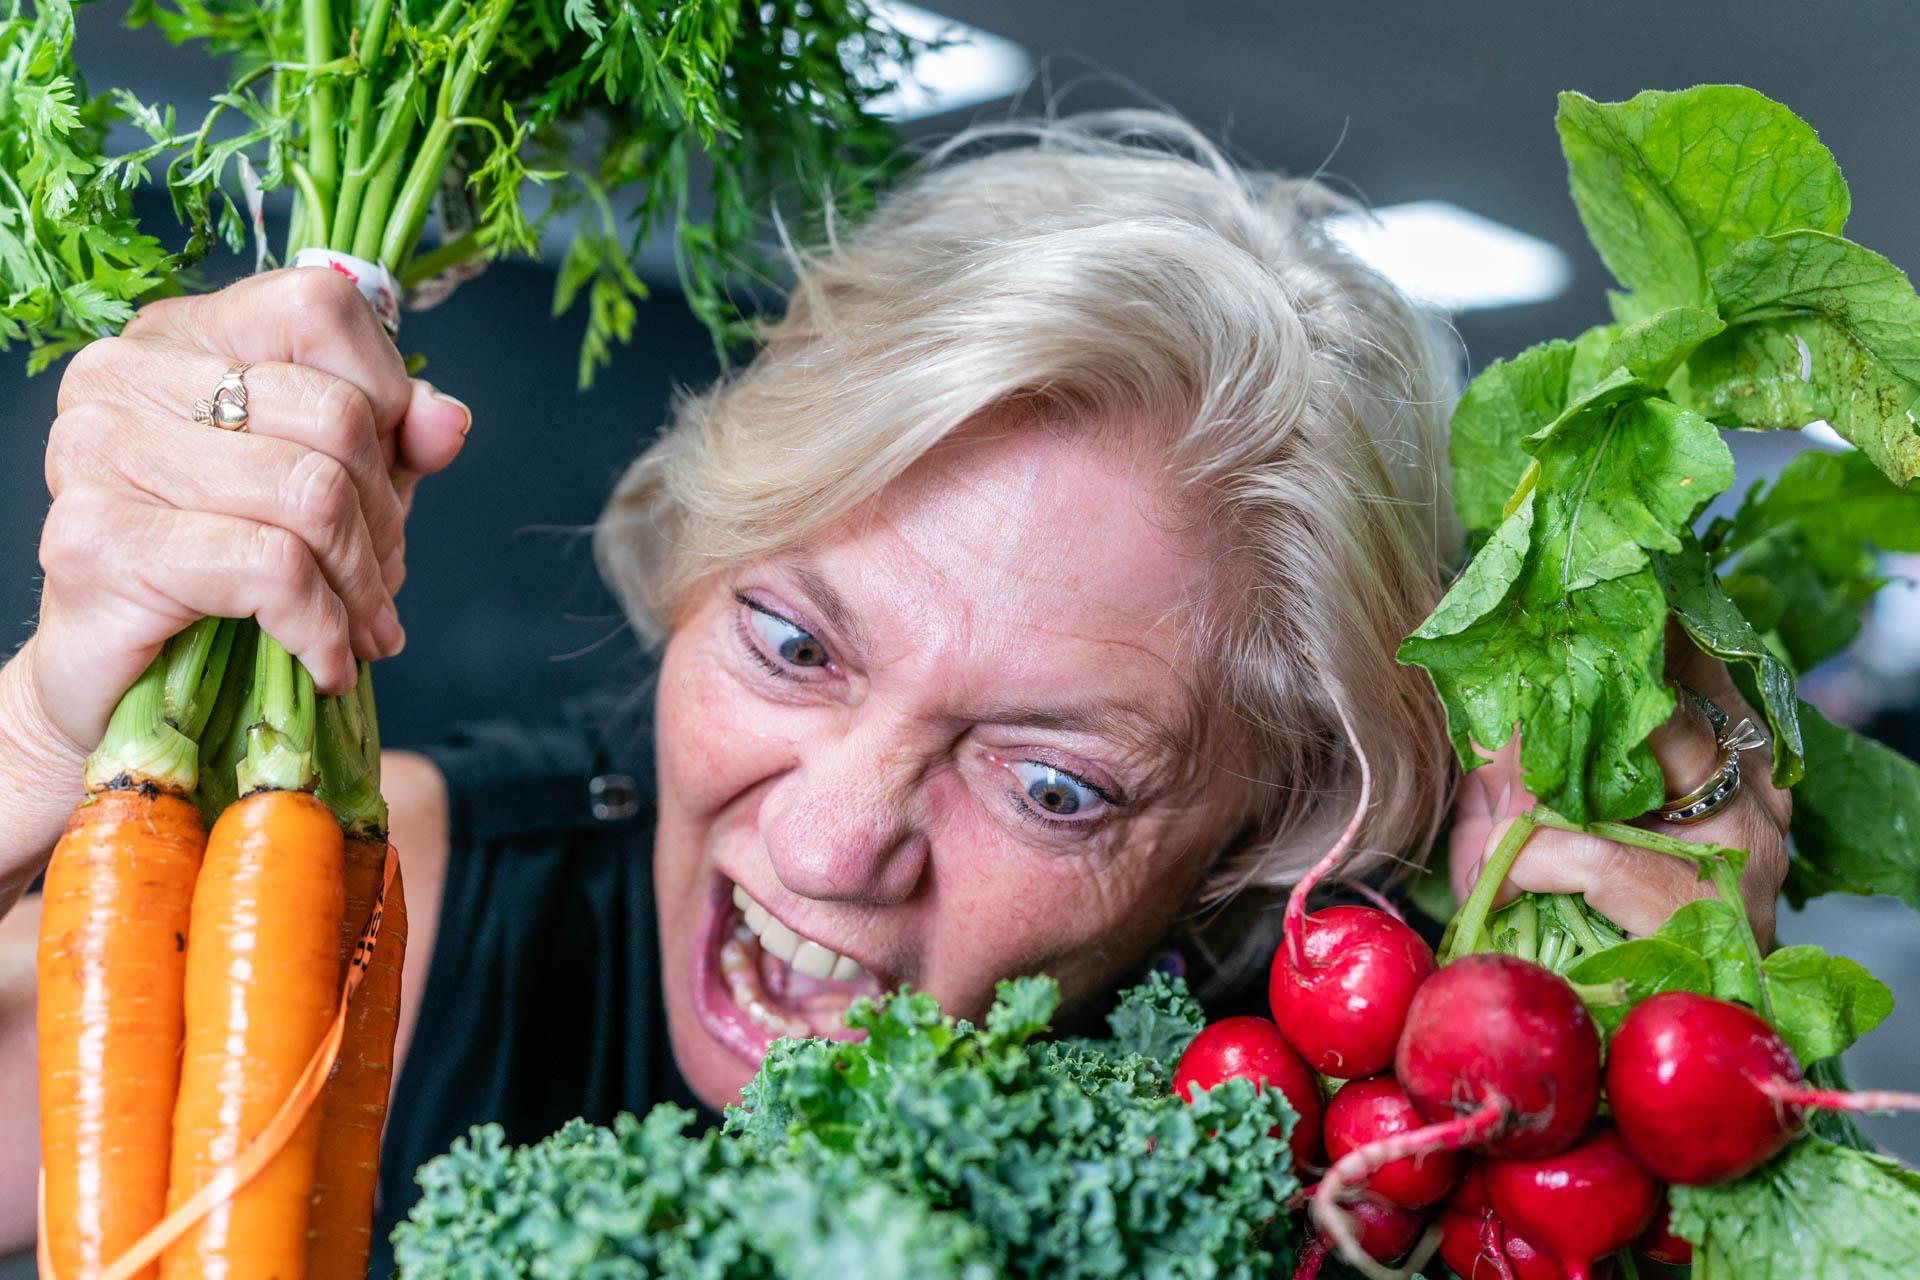 lead magnet - 5 fitness myths - violet veggies 3x2.jpg